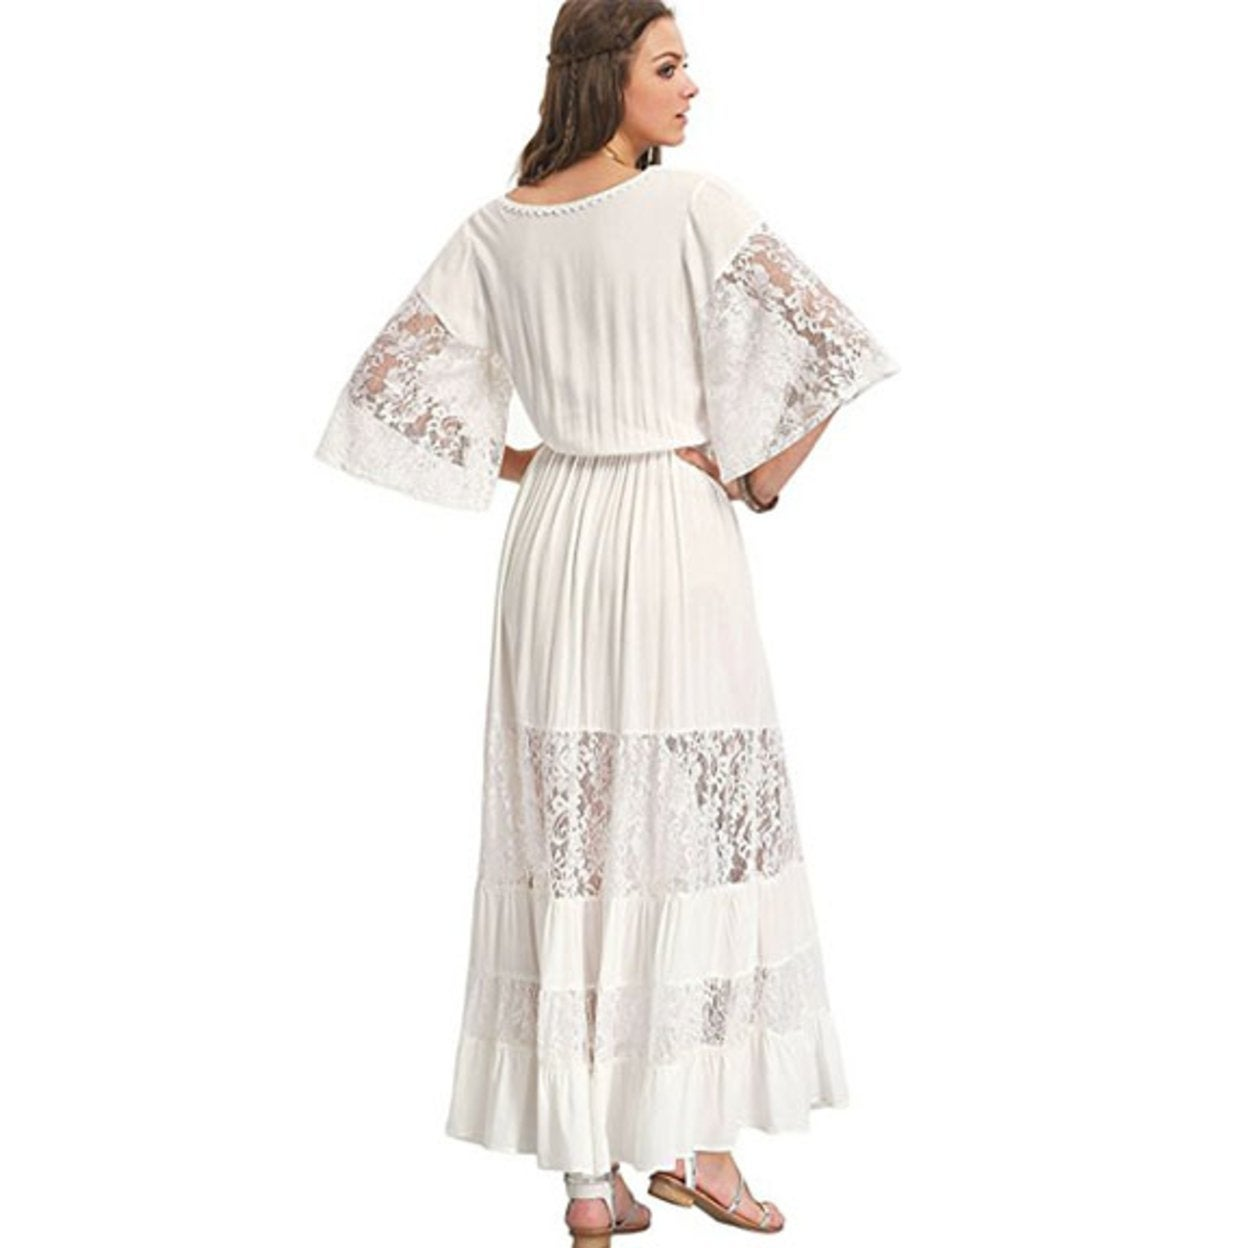 2e9a6297a6e Shop Kentiuttd Women's Bohemian Drawstring Waist Lace Splicing White Long  Maxi Dress - Free Shipping On Orders Over $45 - Overstock - 27110548